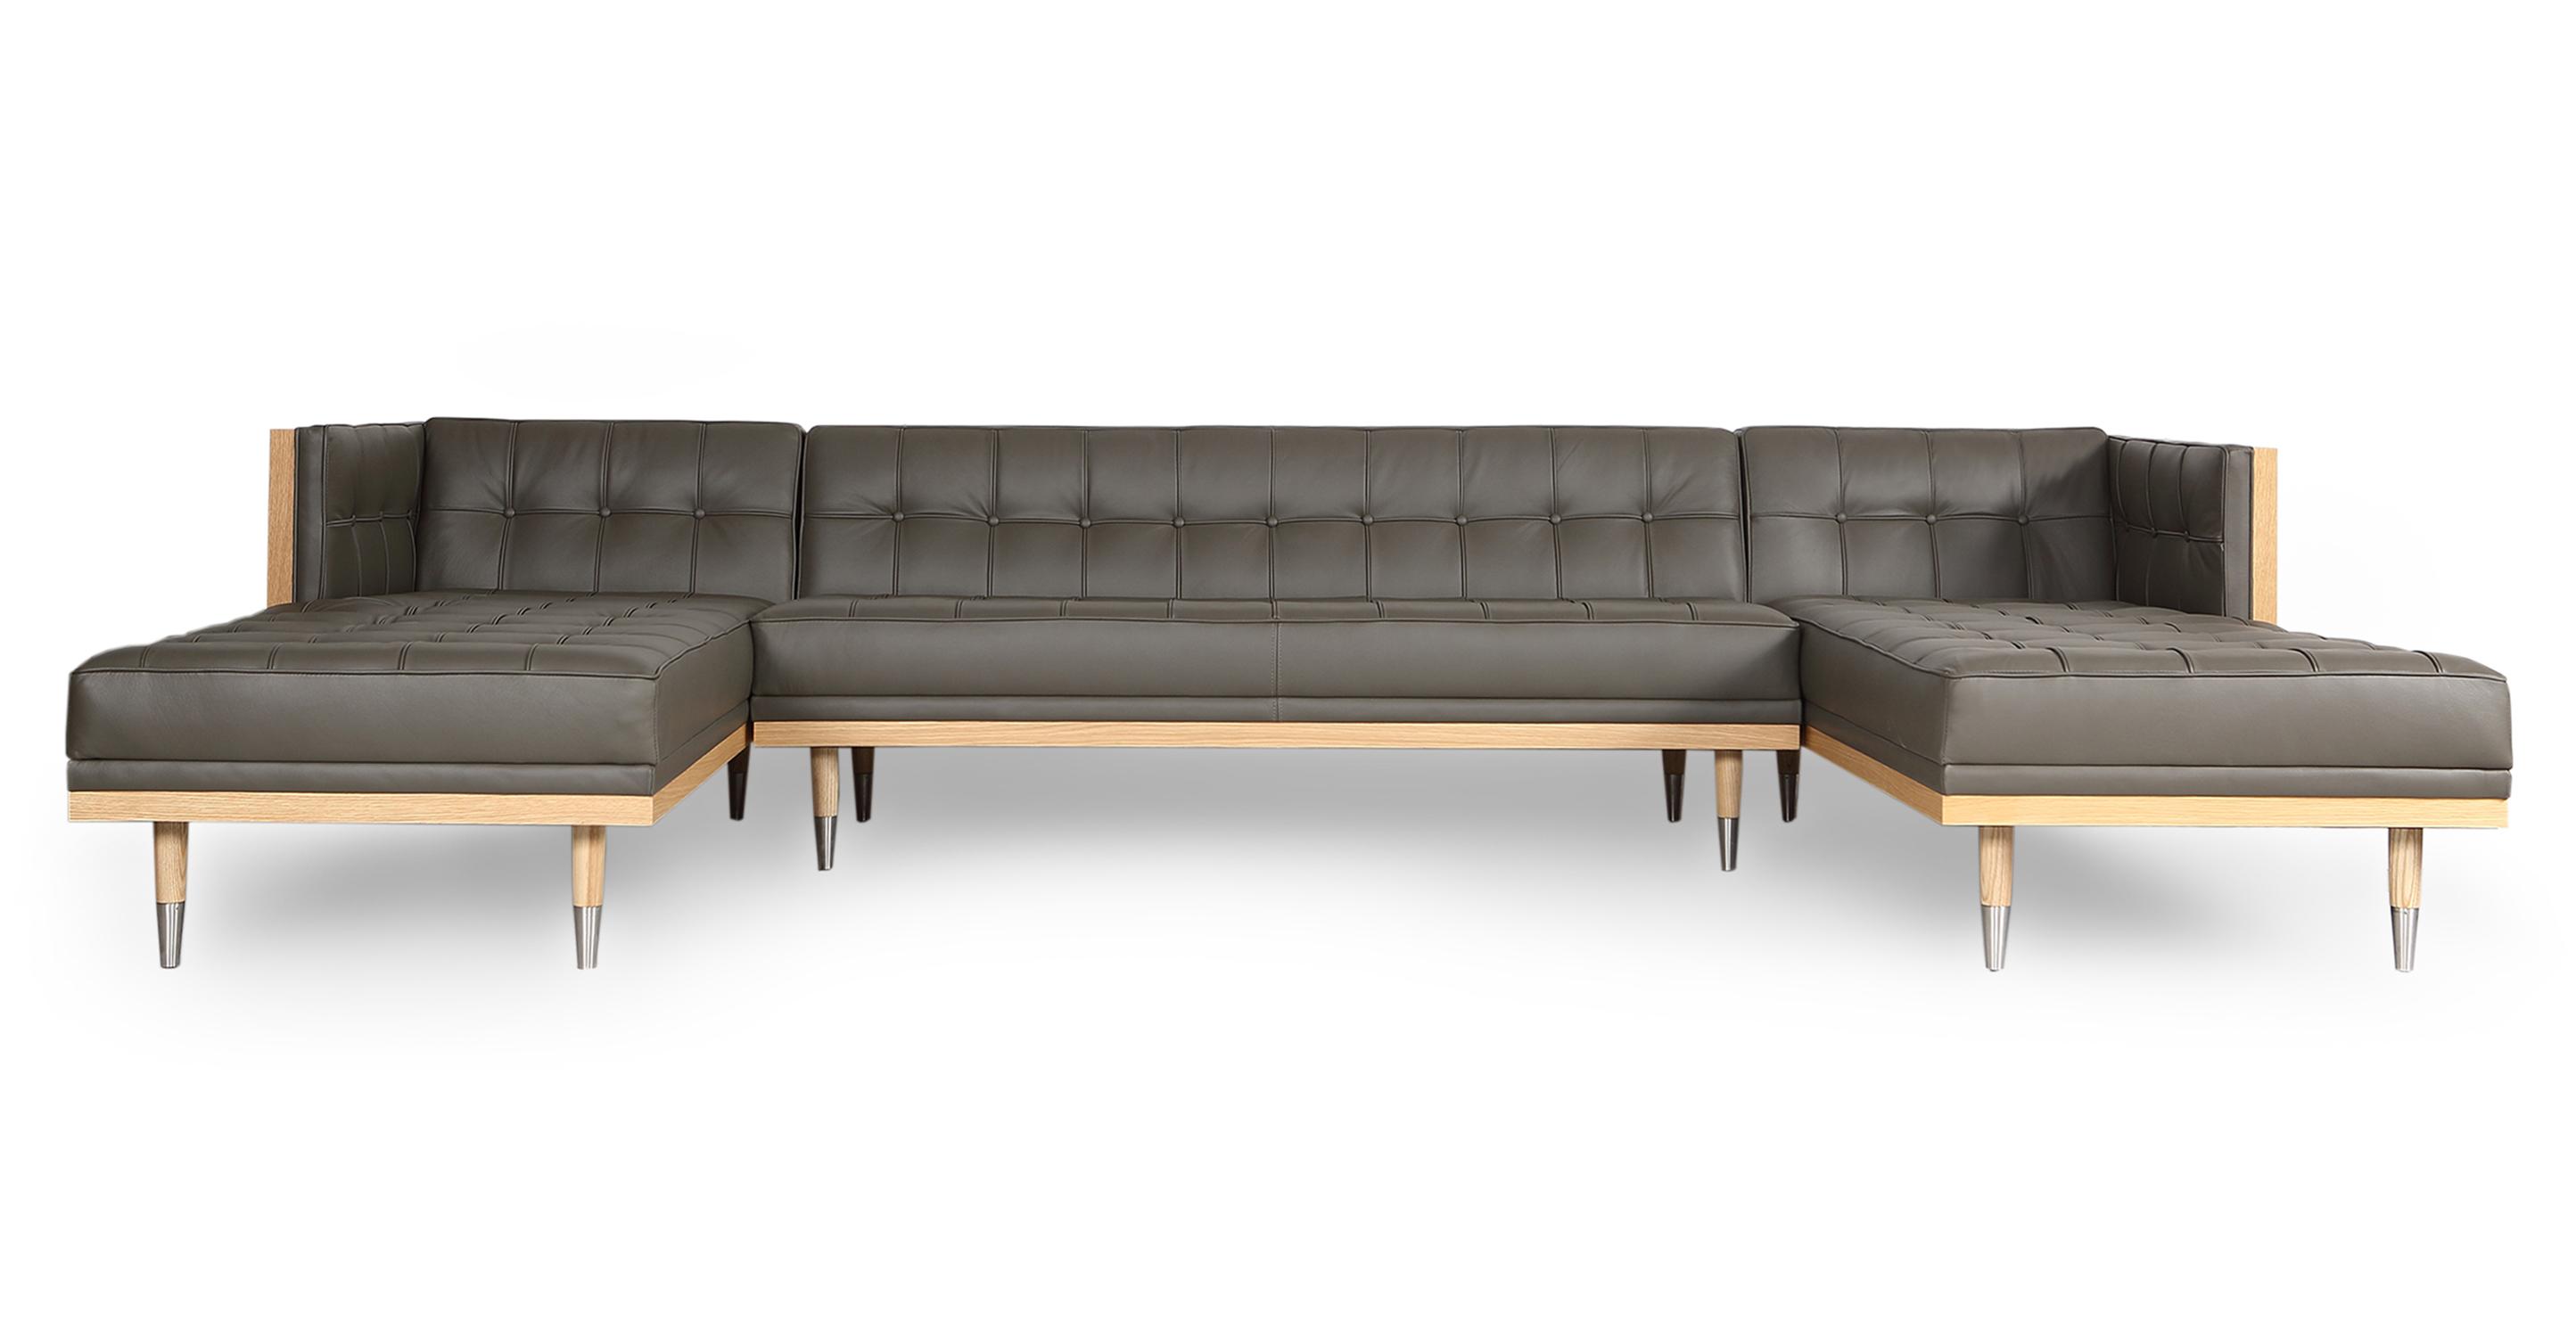 "Woodrow Box 126"" Sofa U-Sectional, Ash/Grey Aniline"